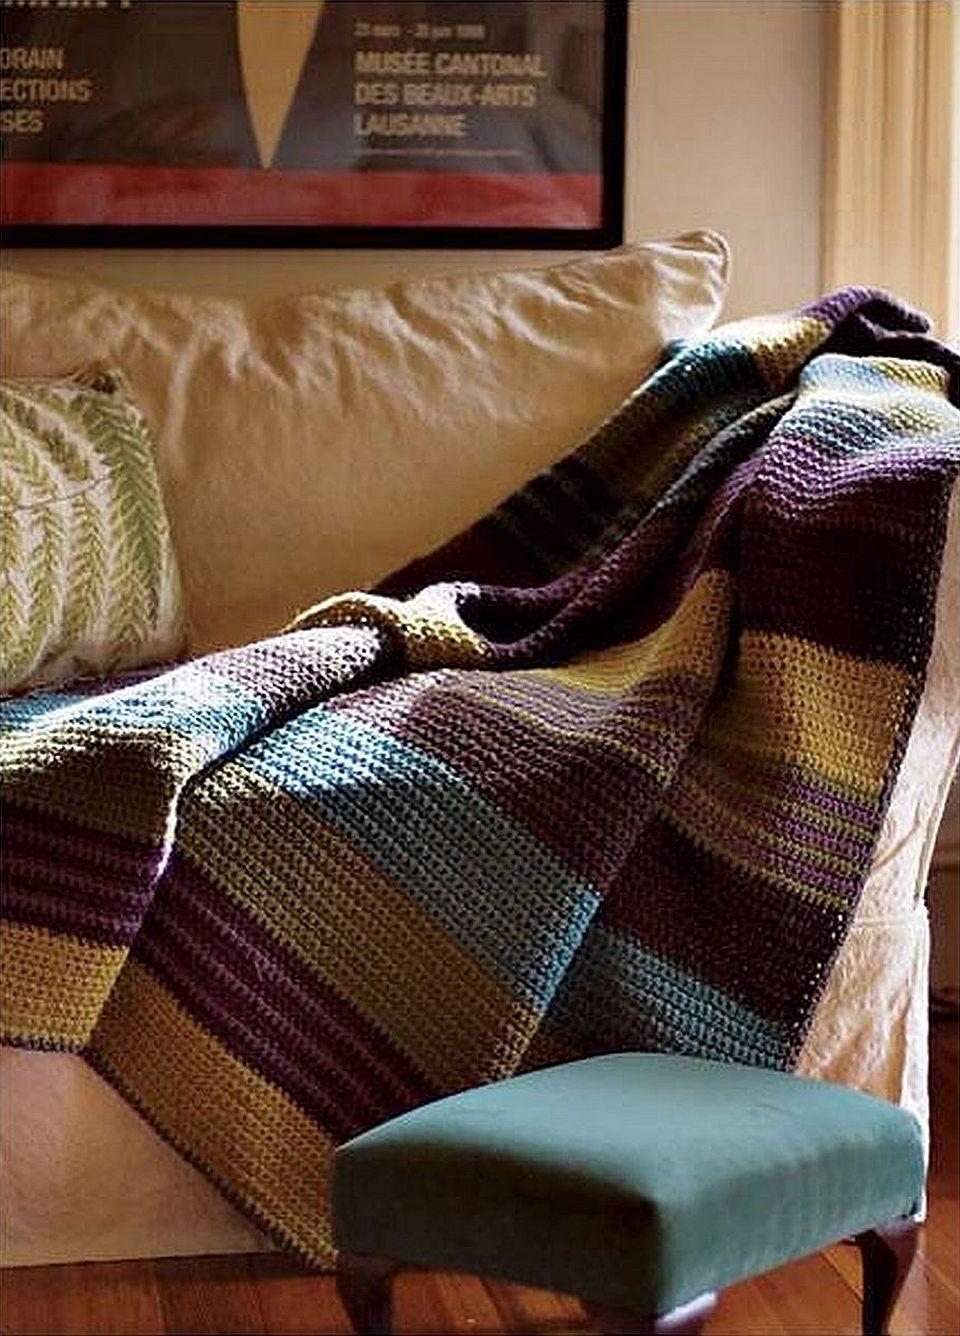 adelaparvu.com despre linii de lana, decoratiuni din lana, designer Cristina Danescu, Foto Diana Viu (1)